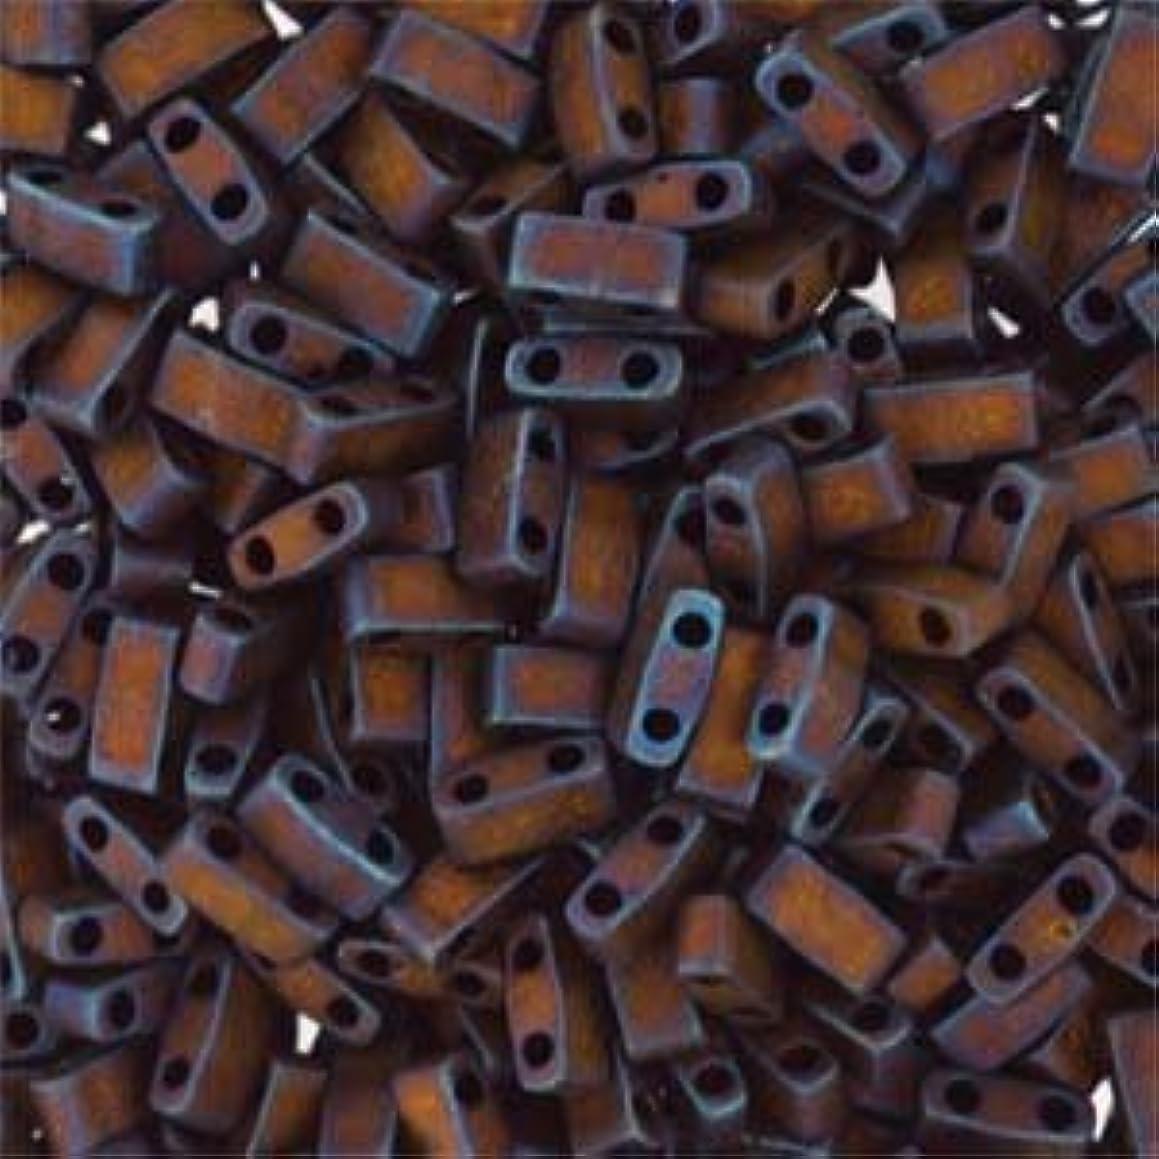 Miyuki Half Tila Beads 2 Hole Rectangle Seed Beads 2.3 x 5mm 7.8 Grams Matte Metallic Copper